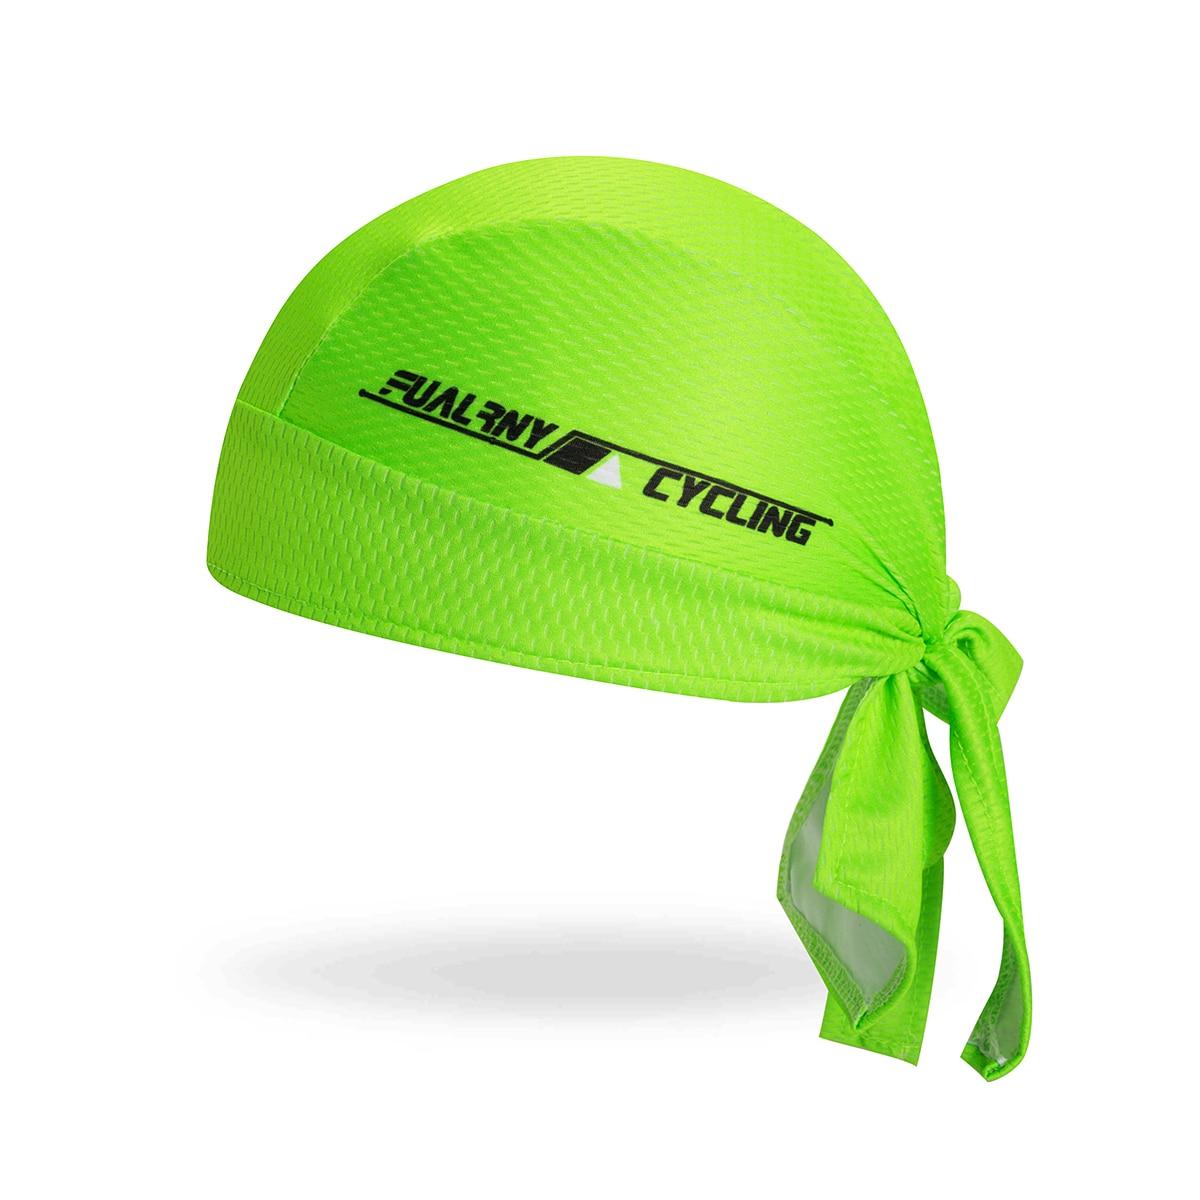 Fualrny 100% Polyester Modesti Outdoor Sport MTB Bicycle Bandana Hat Cycling Cap Pirate Head Scarf Headband Bike Headwear